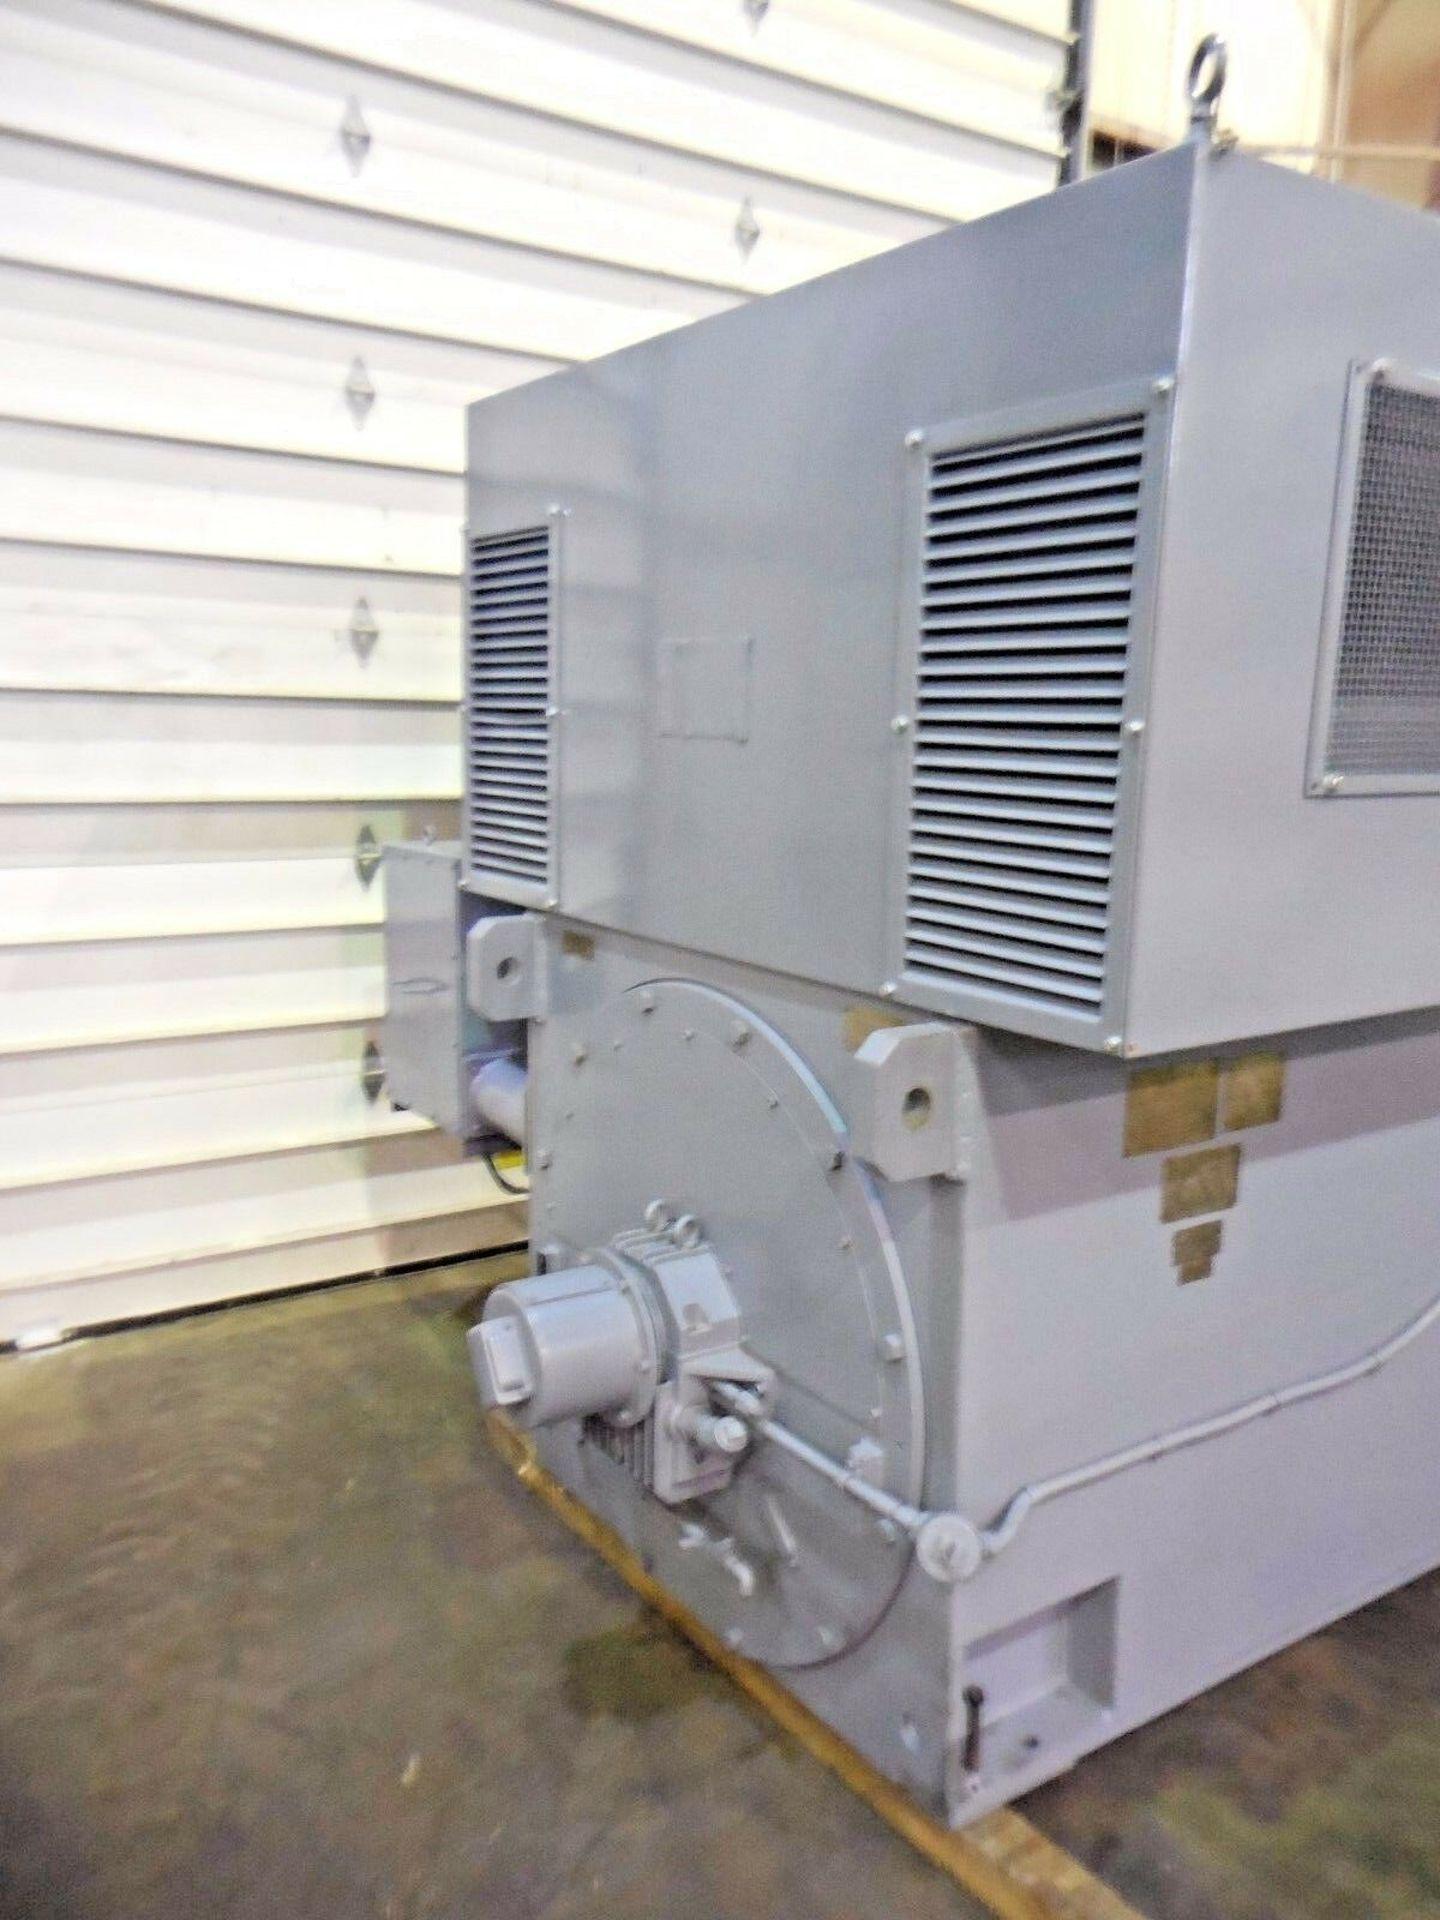 Westinghouse 2500 HP Induction Motor. 1190 RPM. 5614. 4000 V. 3 Ph. 60 Hz. - Image 3 of 4